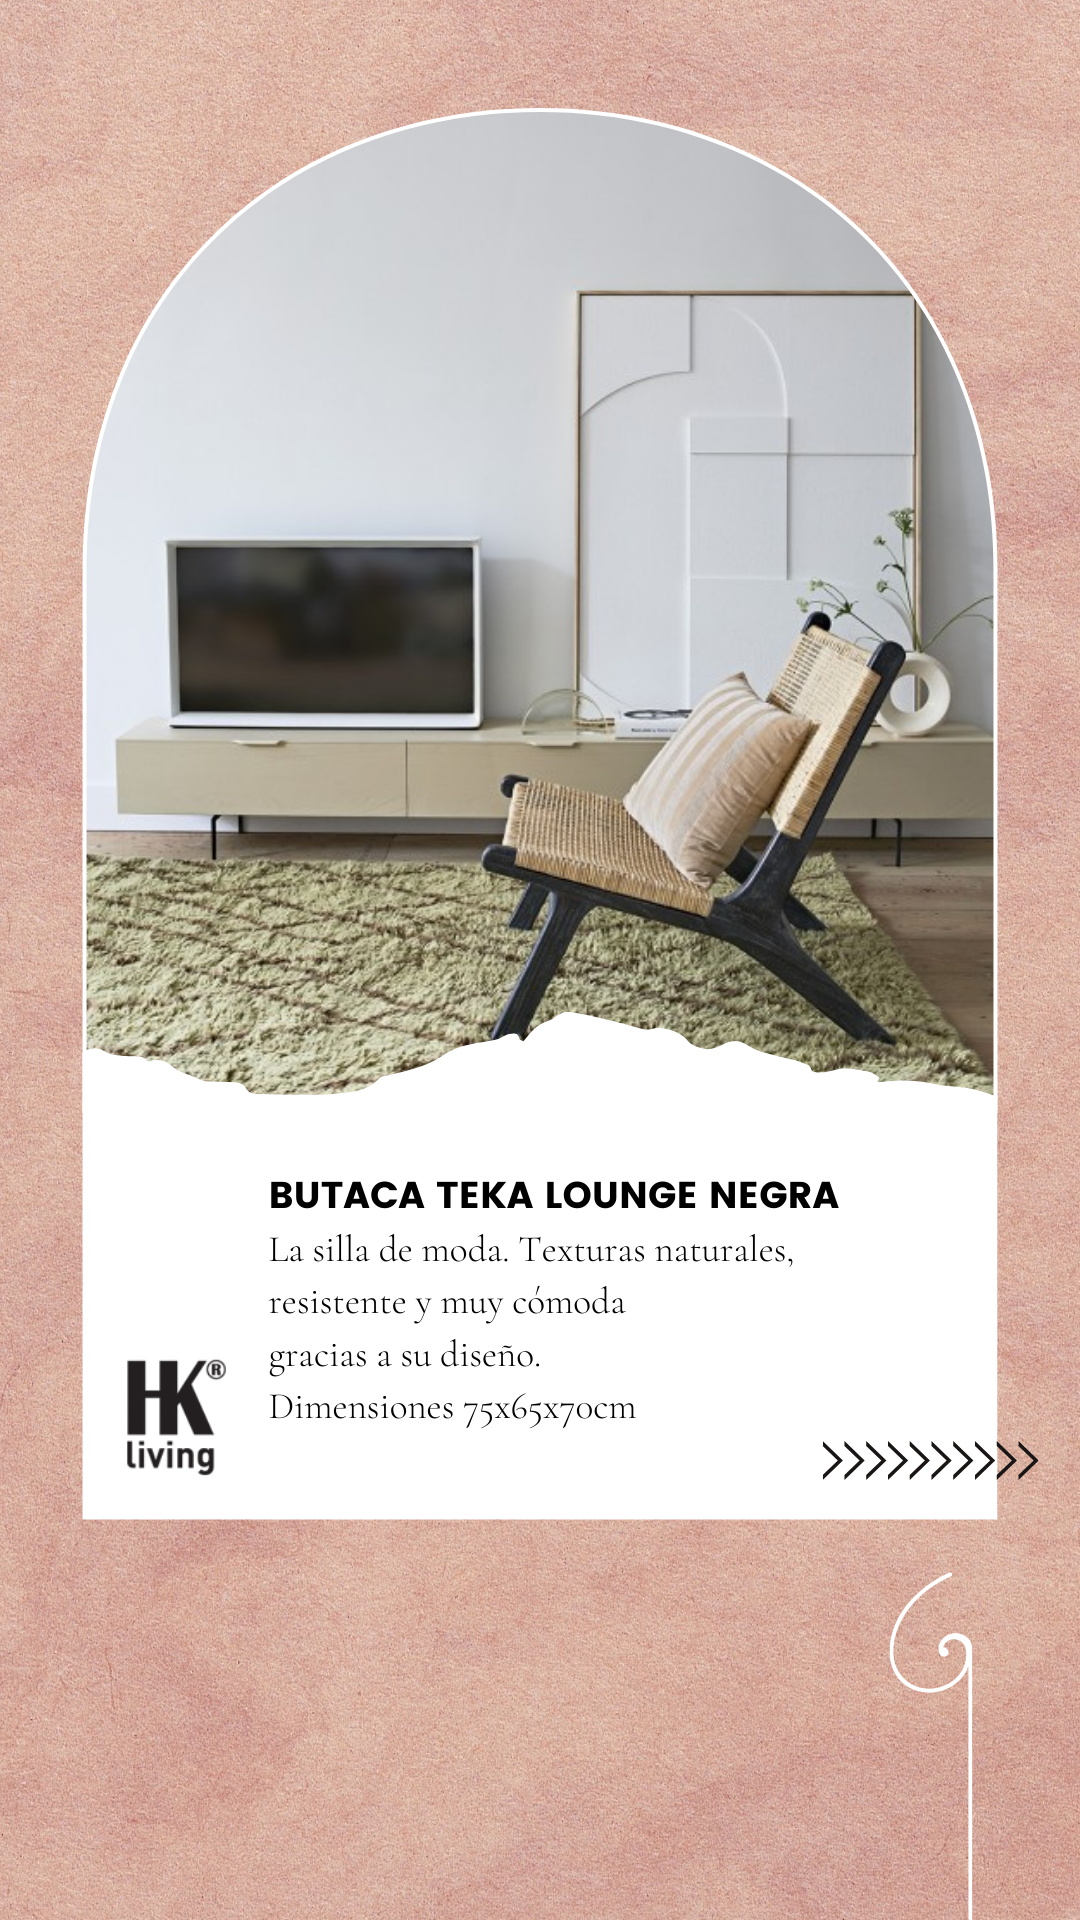 Butaca Teka Lounge Negra